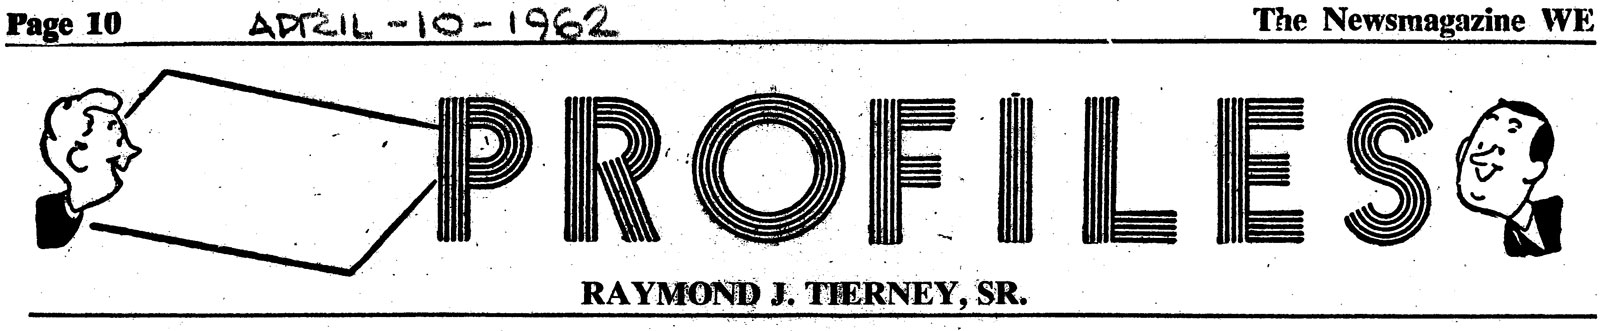 Newsmagazine WE Profiles Ray Tierney